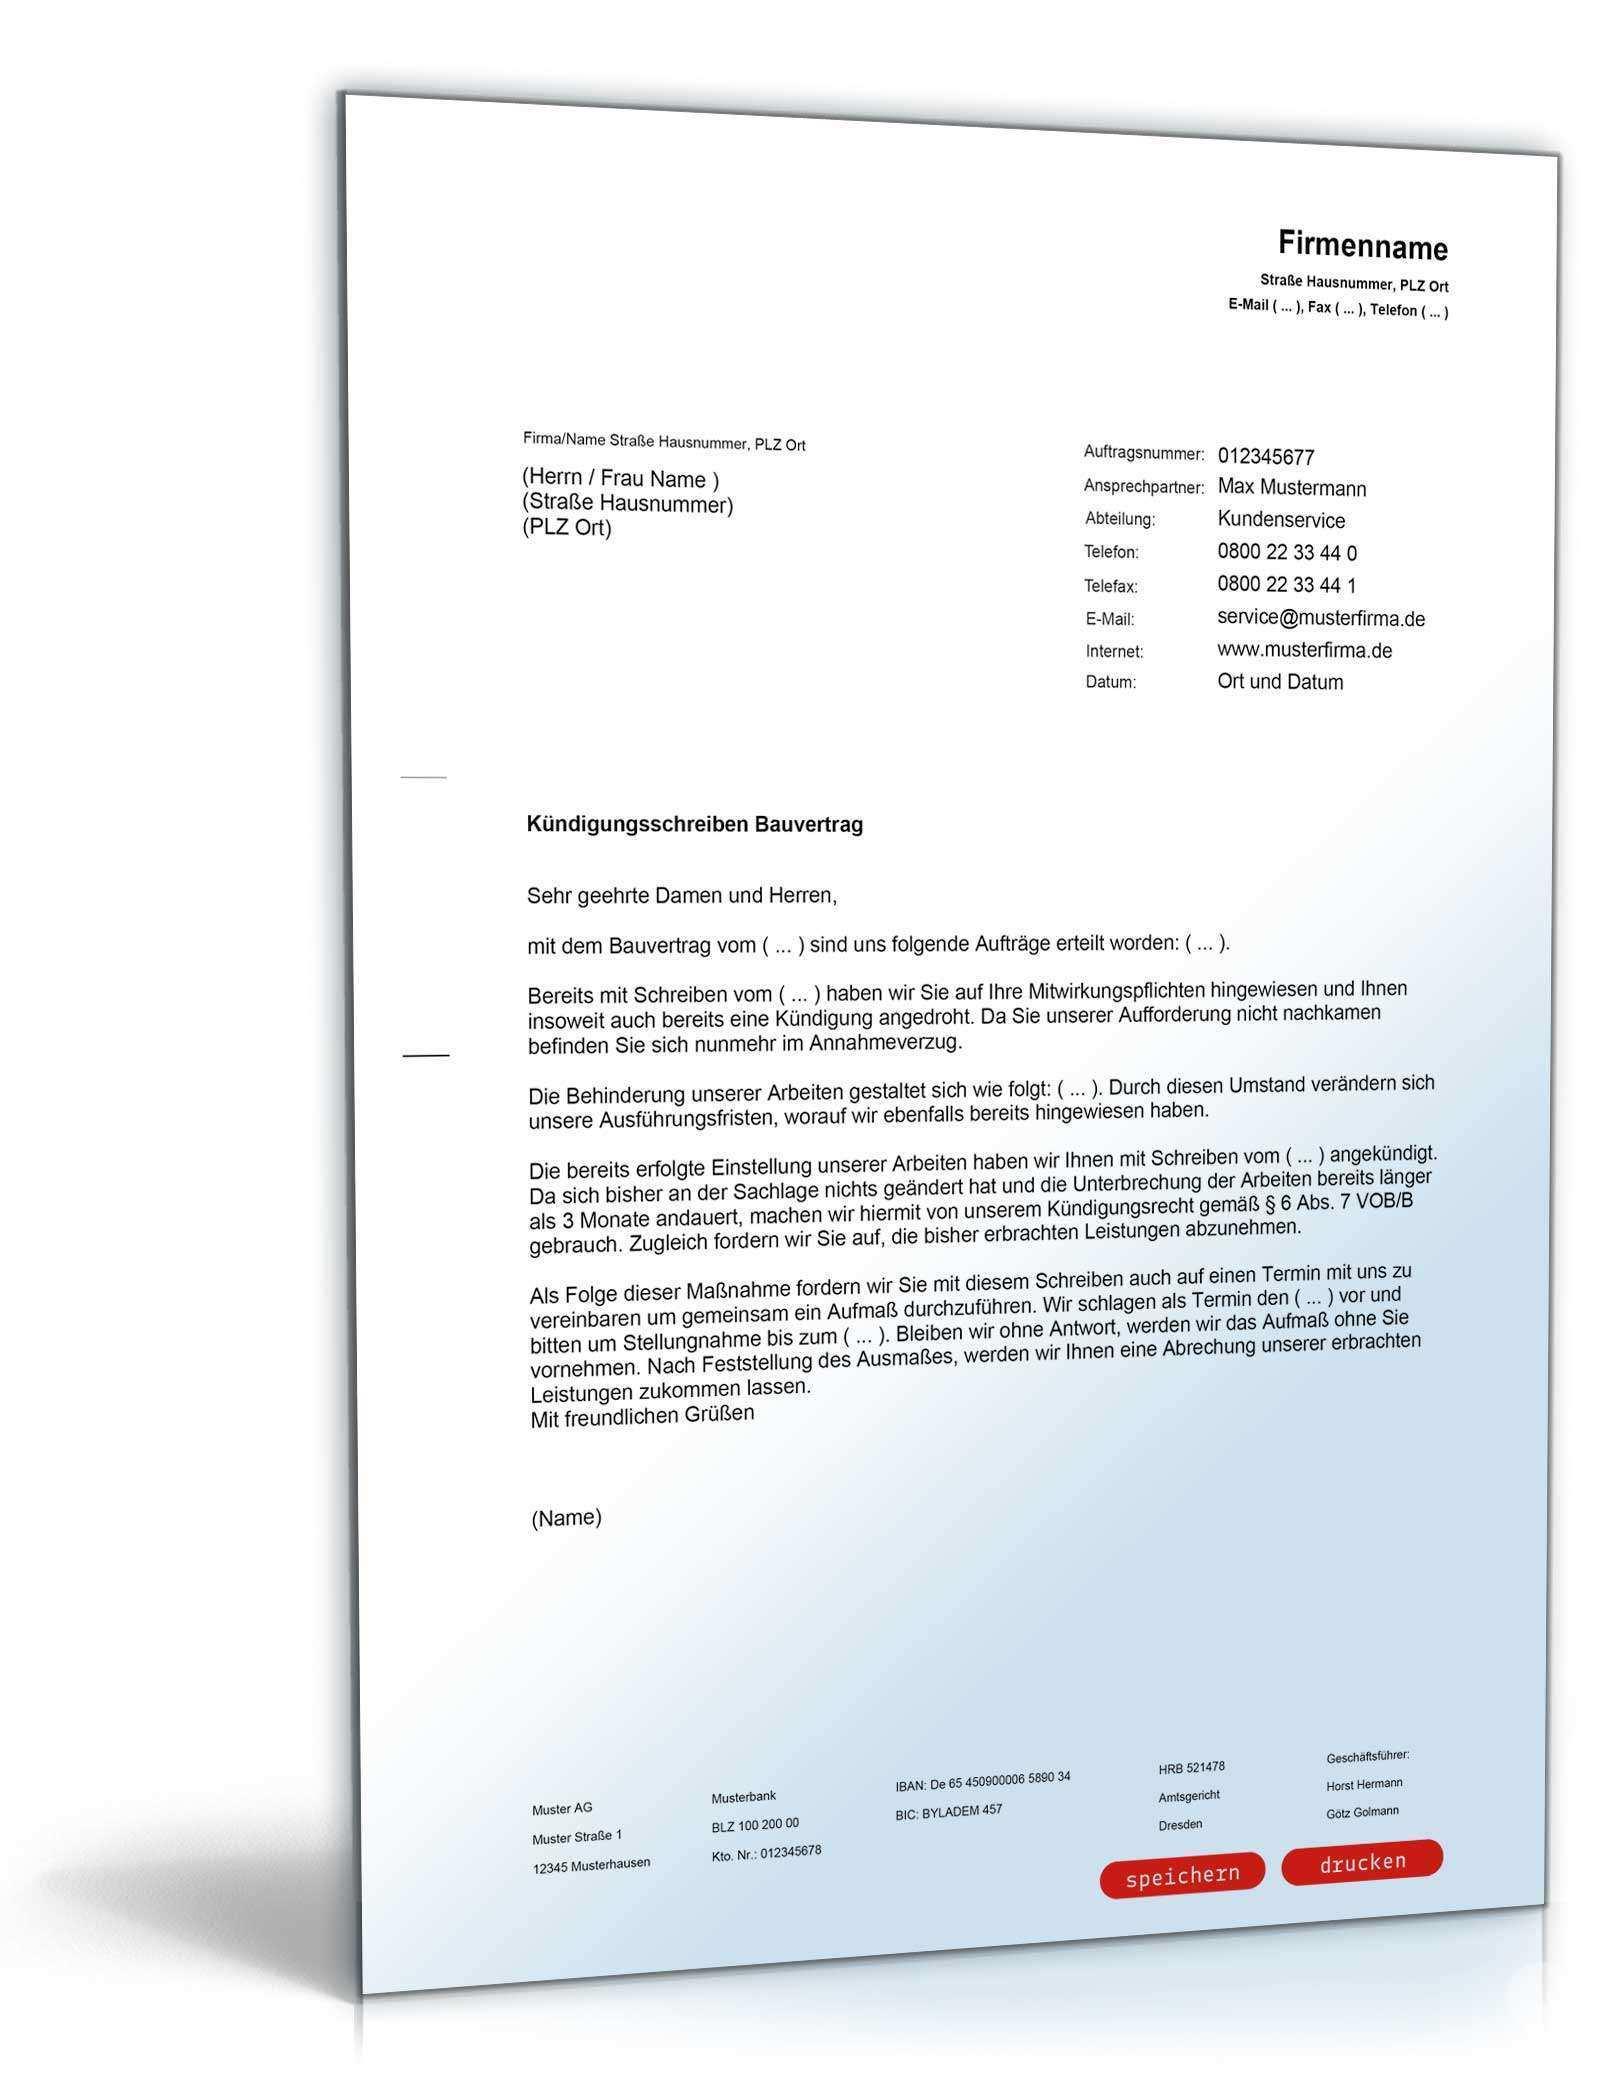 Kundigung Bauvertrag Muster Zum Download